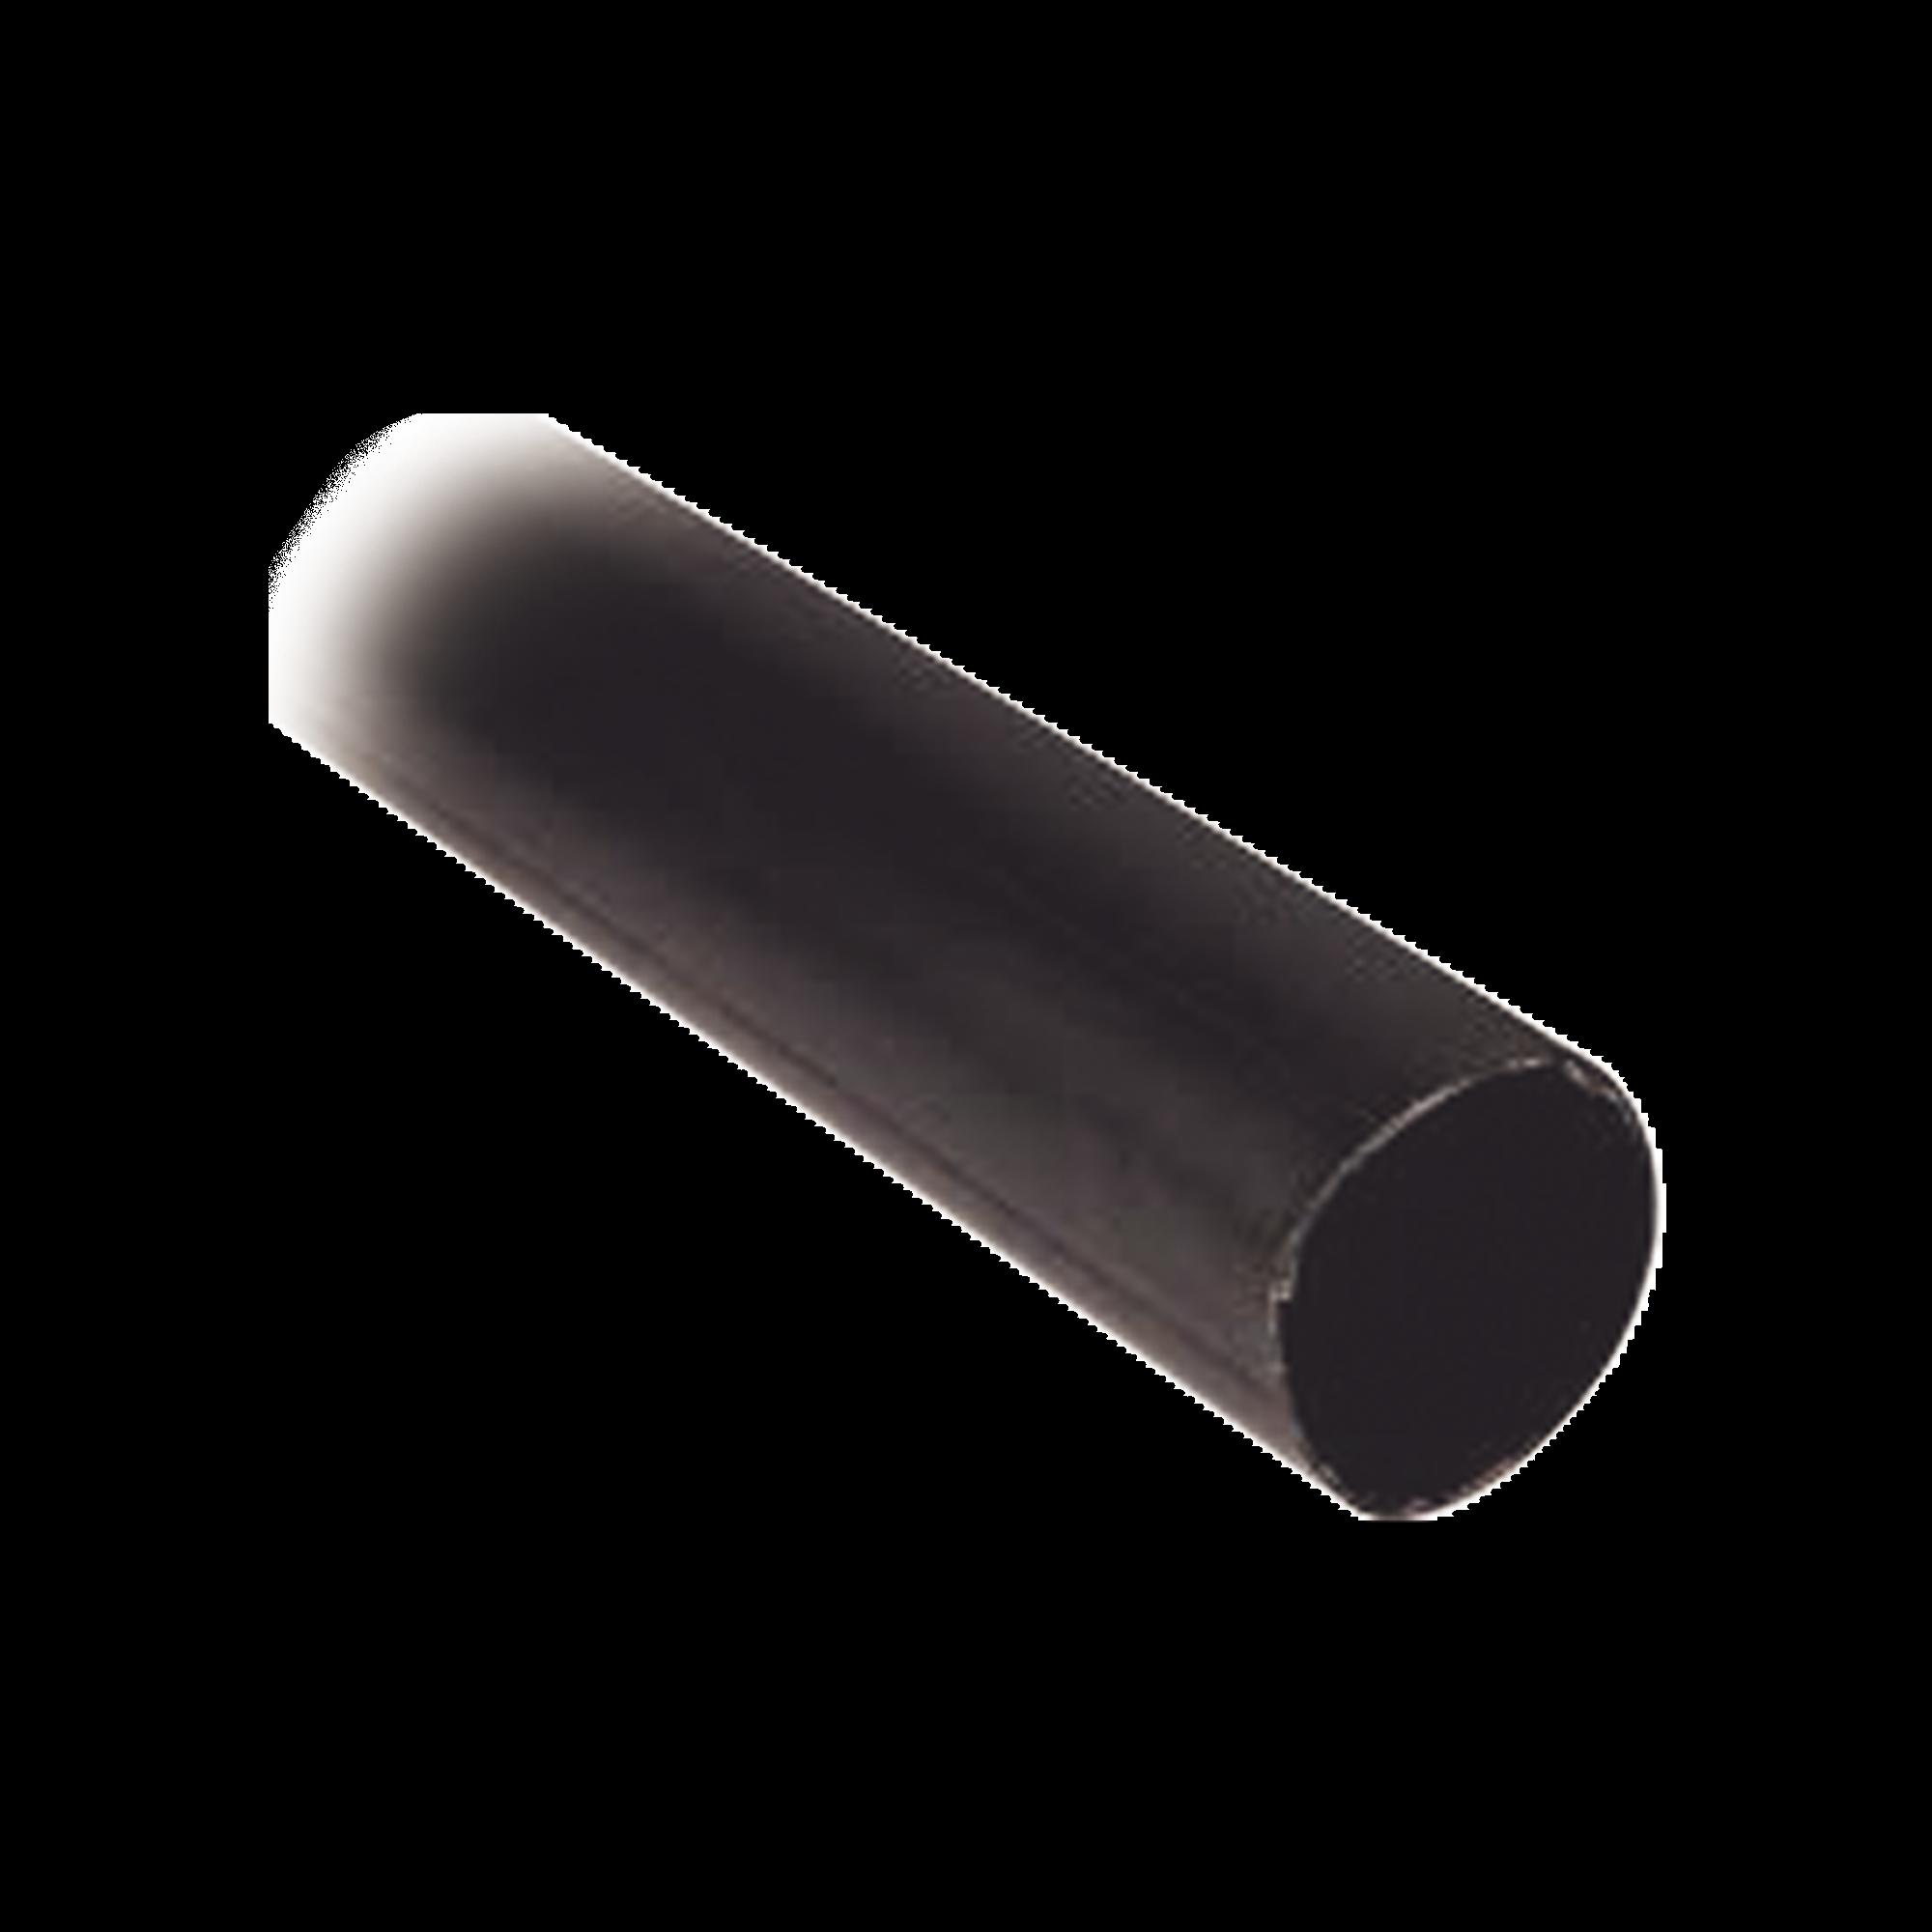 Tubo Termoencogible (Termofit) Negro de 1.2 m, 1.5 de Diámetro, Reduce de 2:1, Poliolefina.